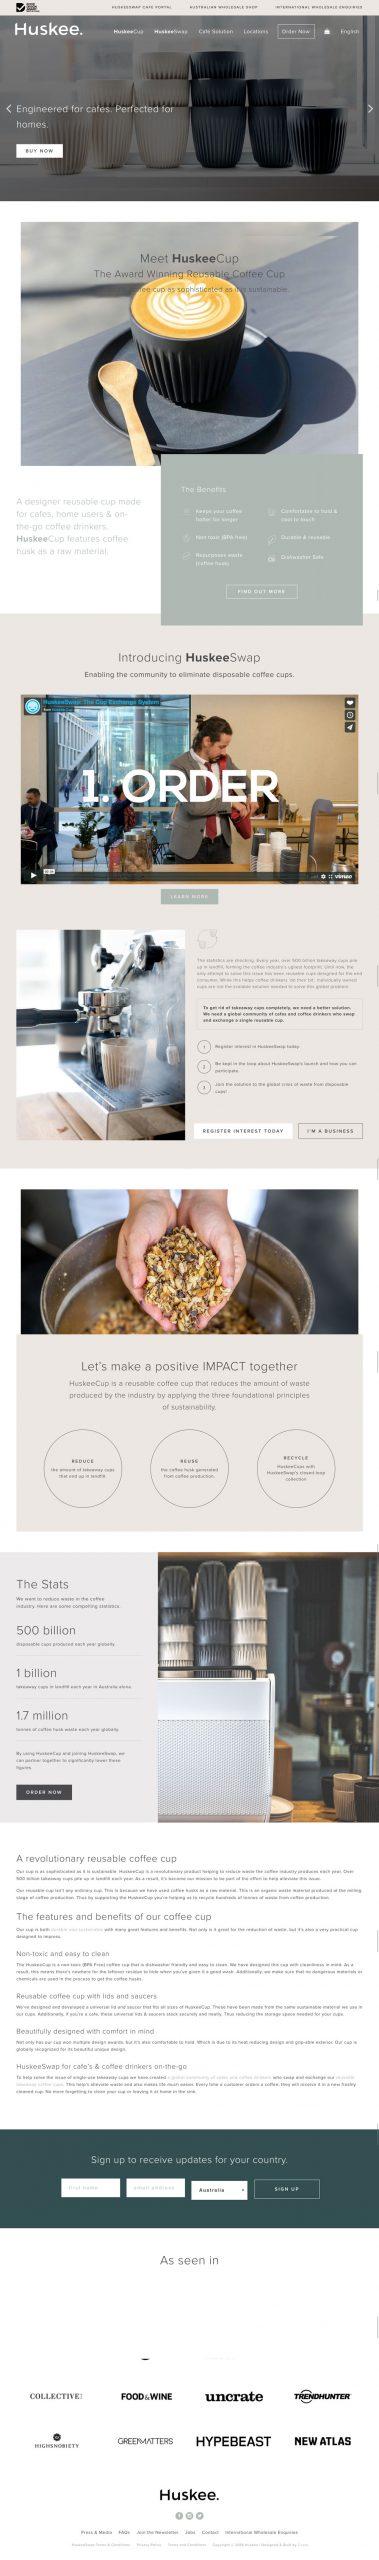 Website Design & Development for Huskee